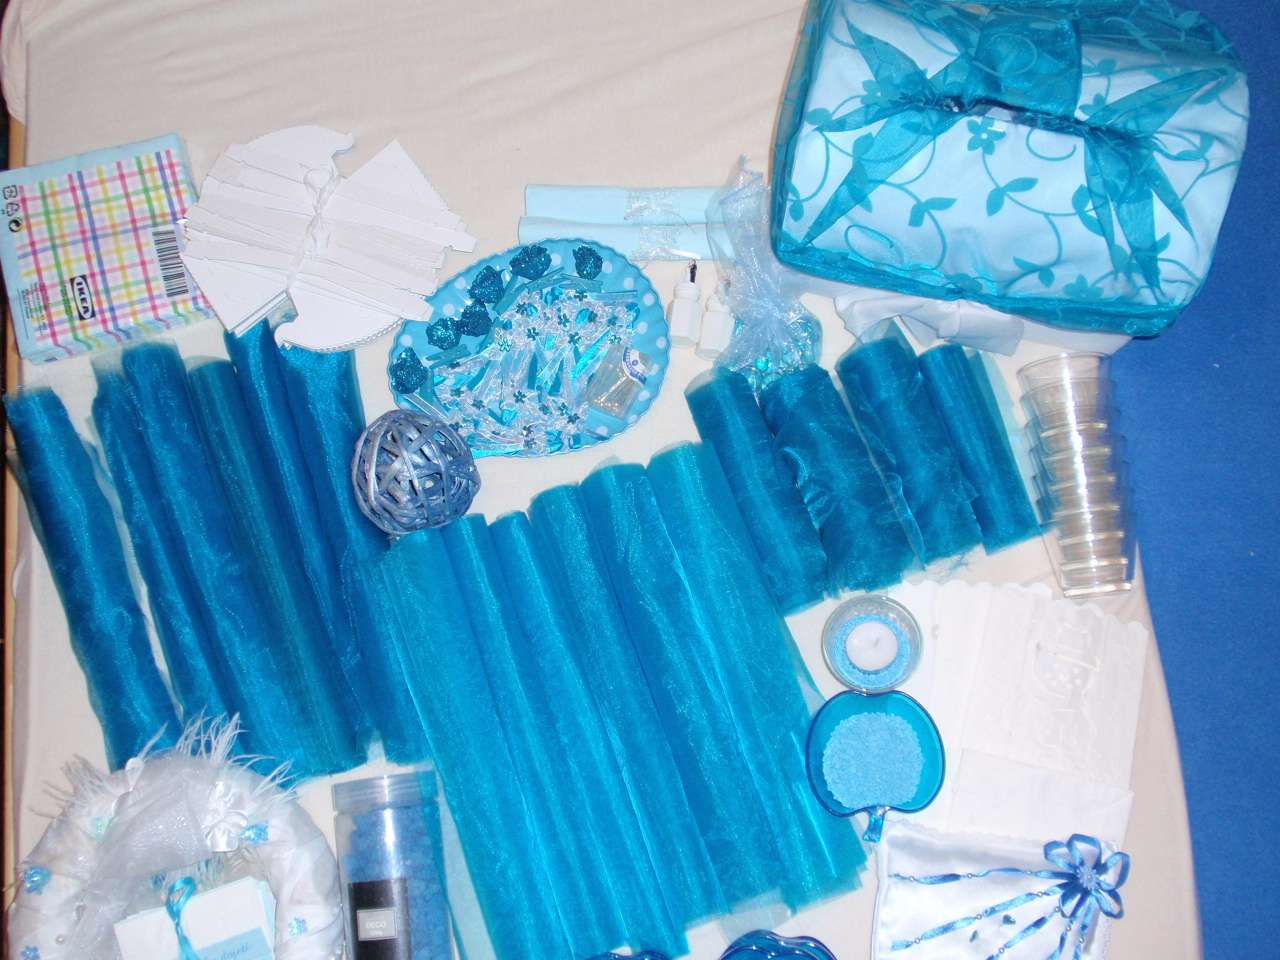 Tyrkysova Modra Dekorace Vyzdoba Organza Vyvazky 749 Kc